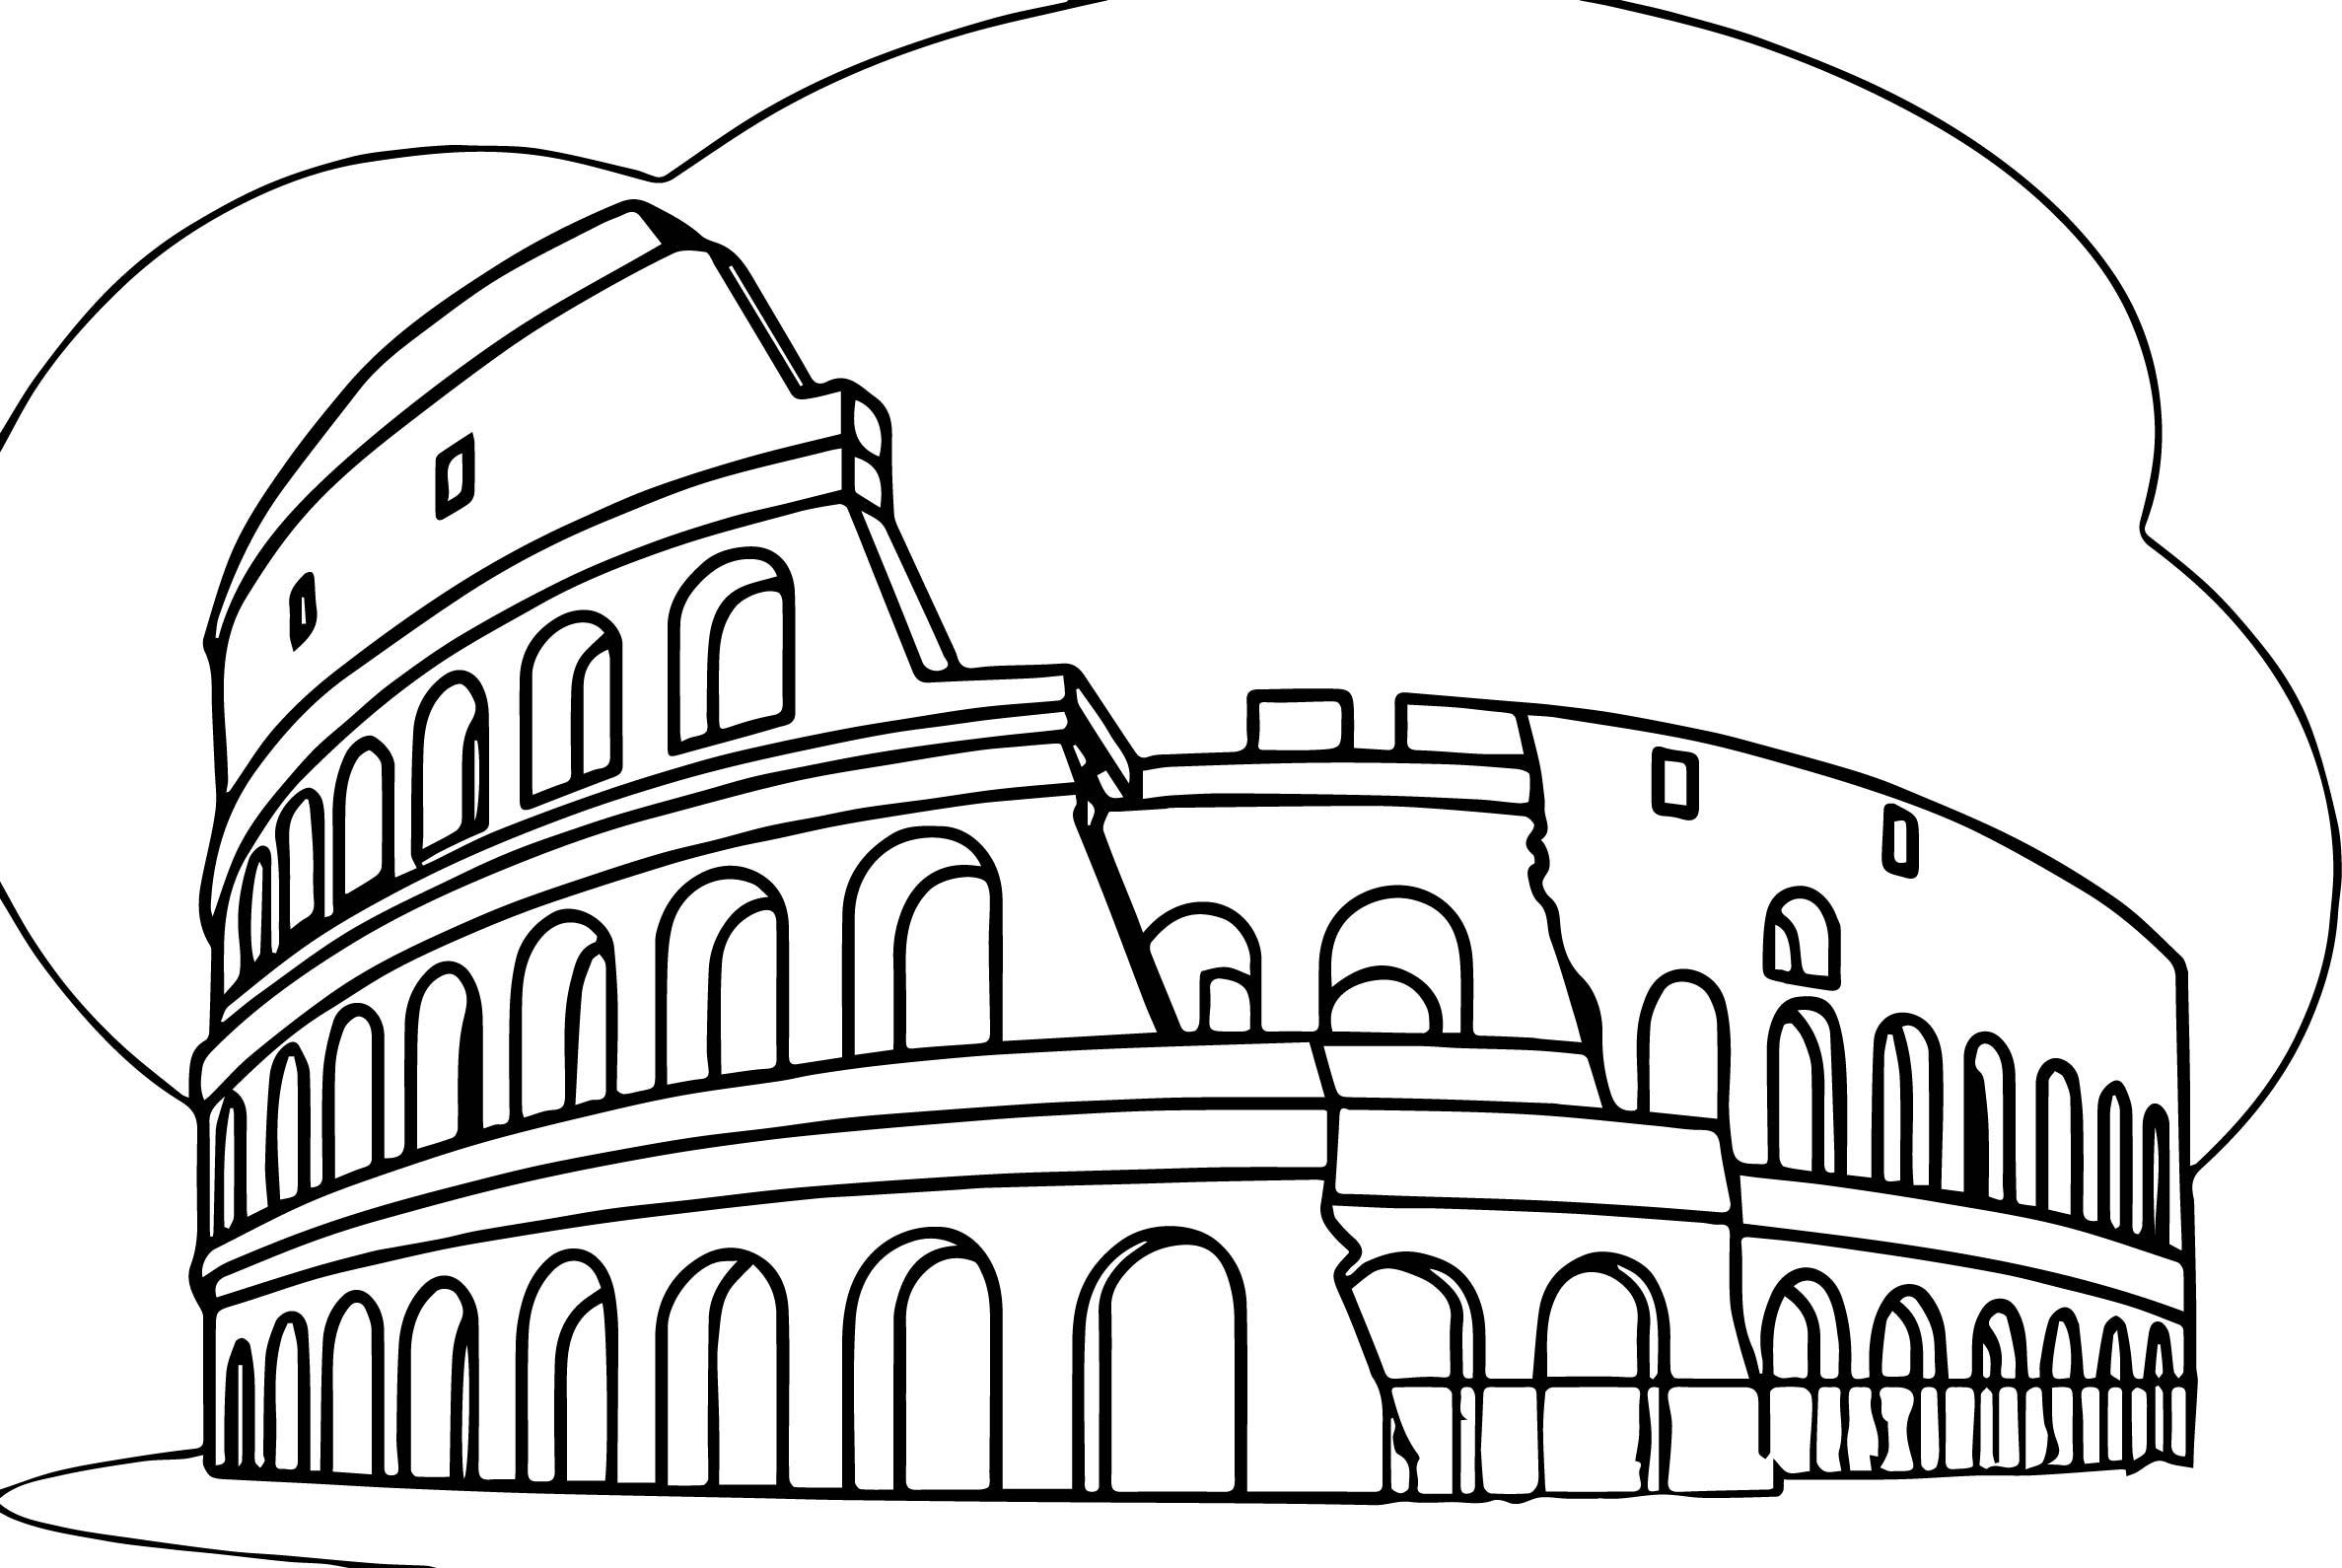 Colosseum clipart wonders the world Colosseum Wecoloringpage Roman Italy Roman